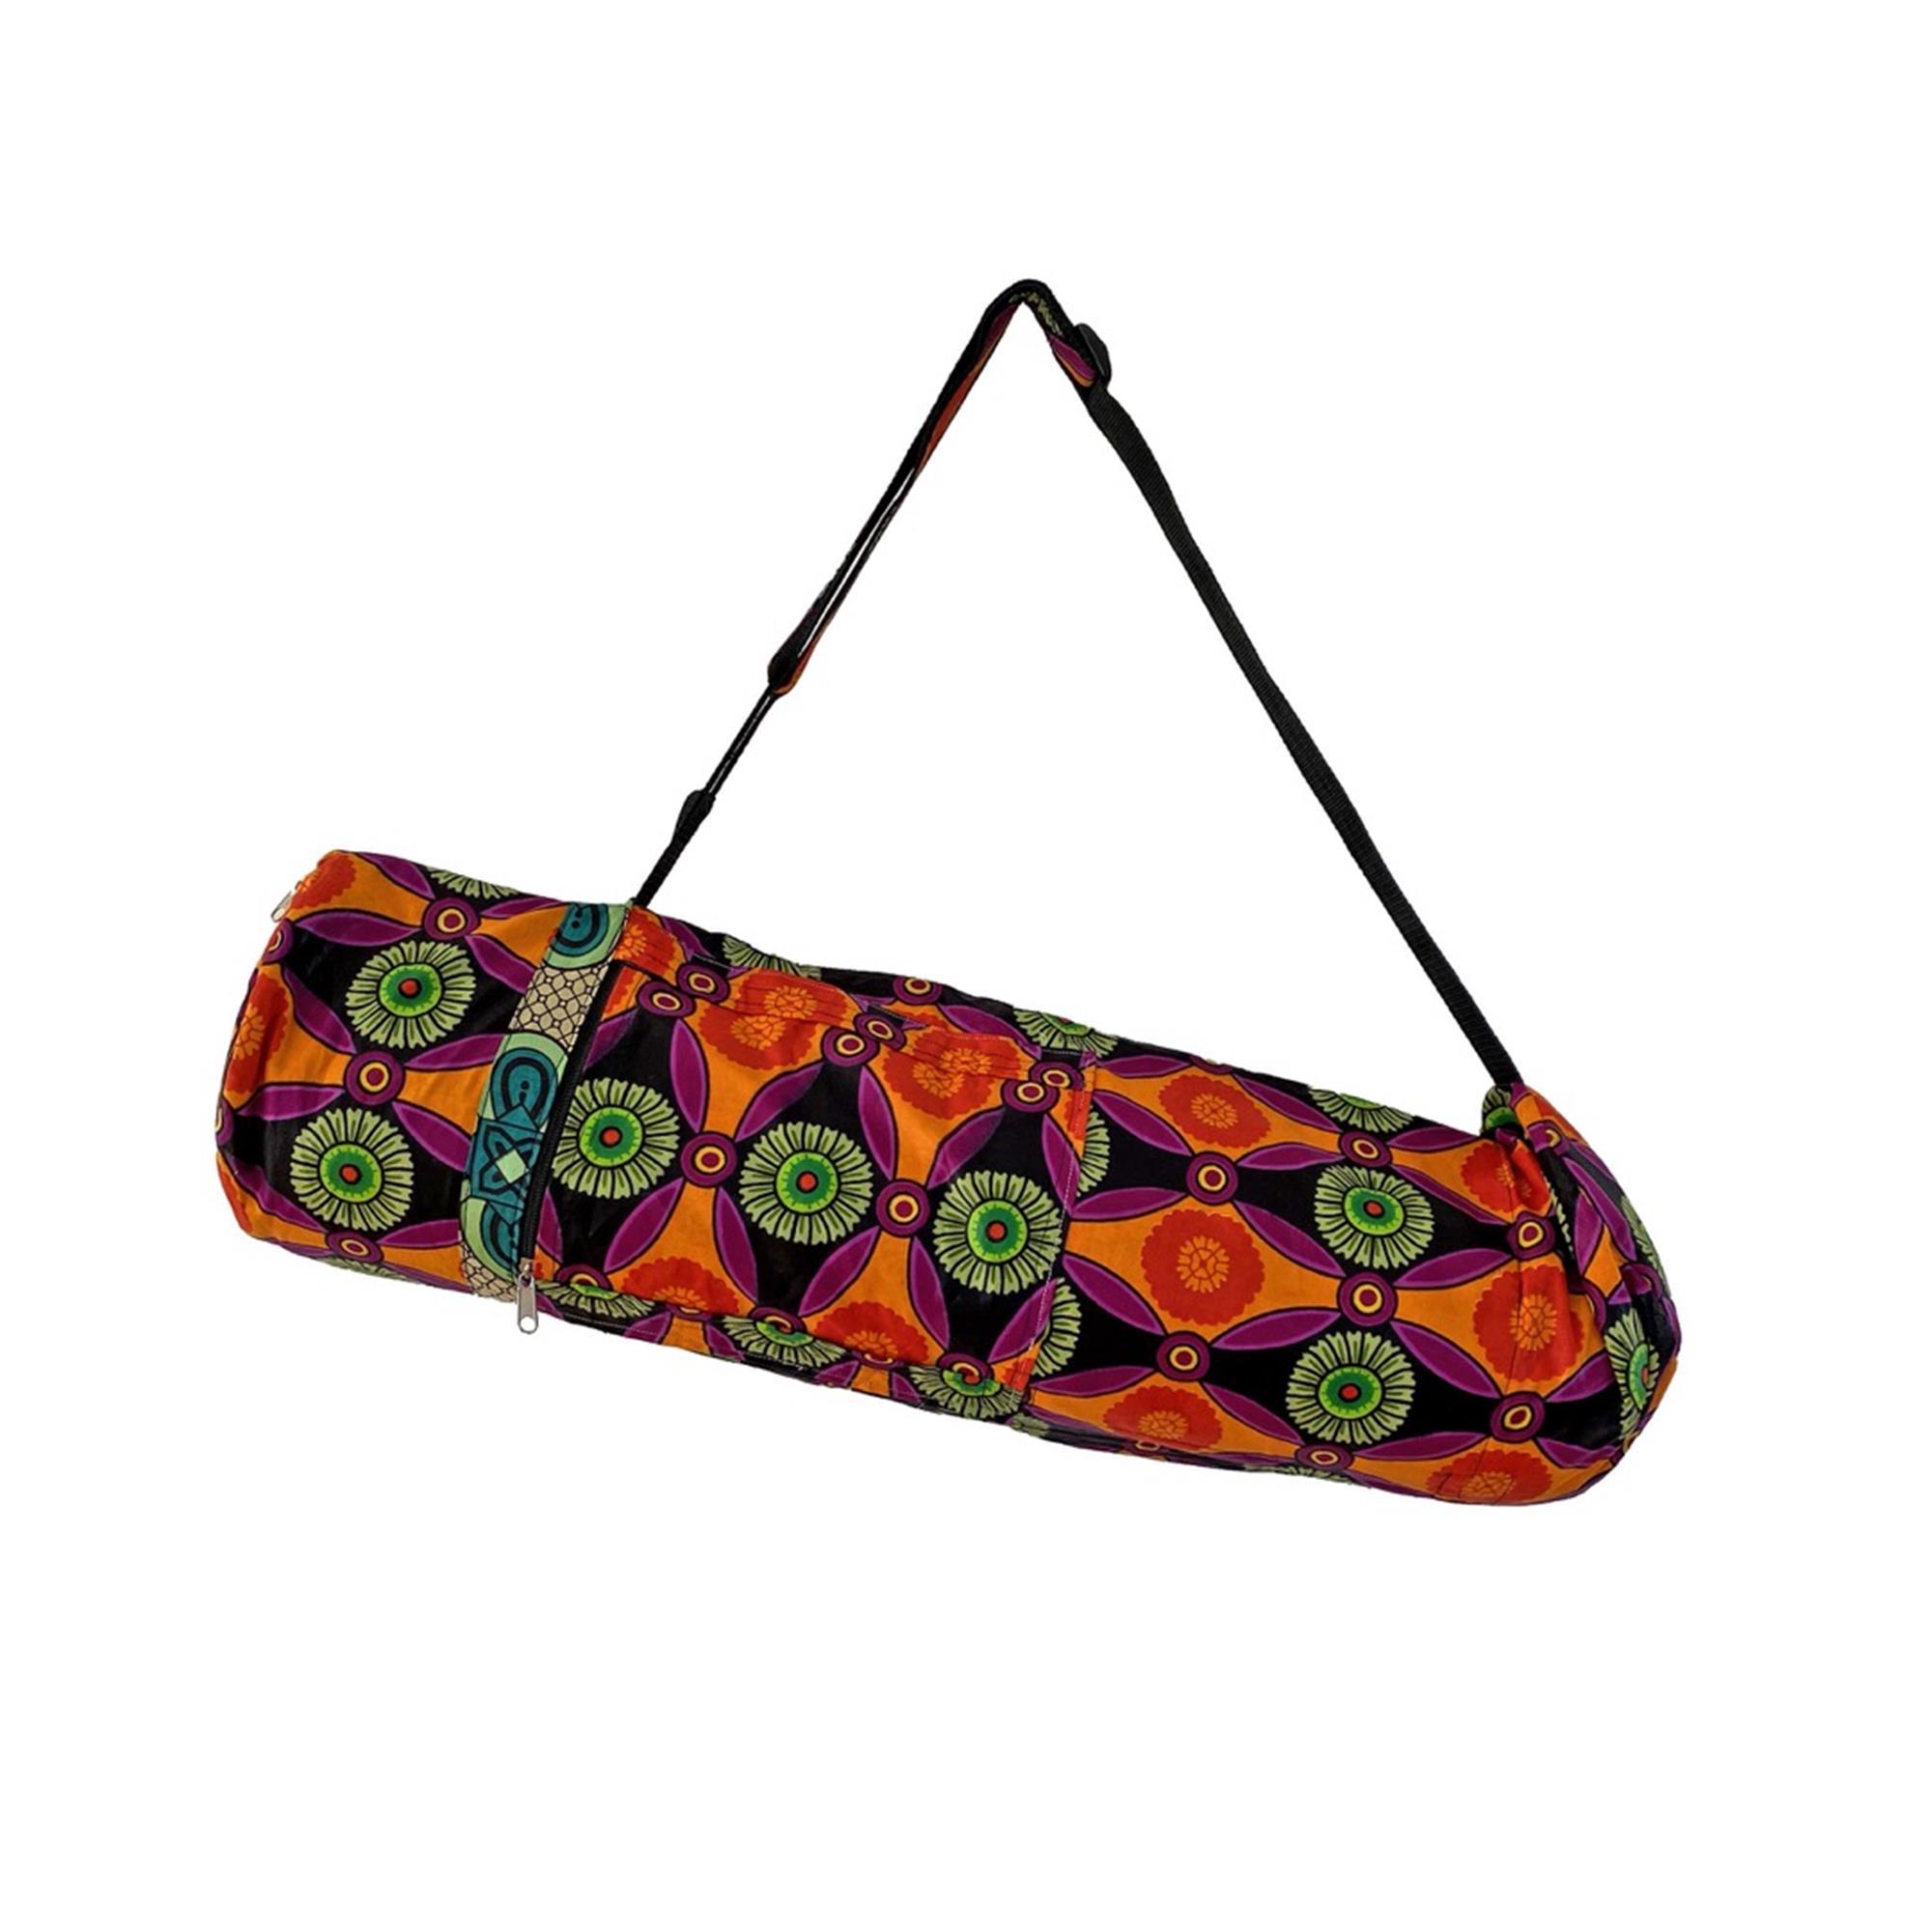 Yoga Mat Bag from Zambia